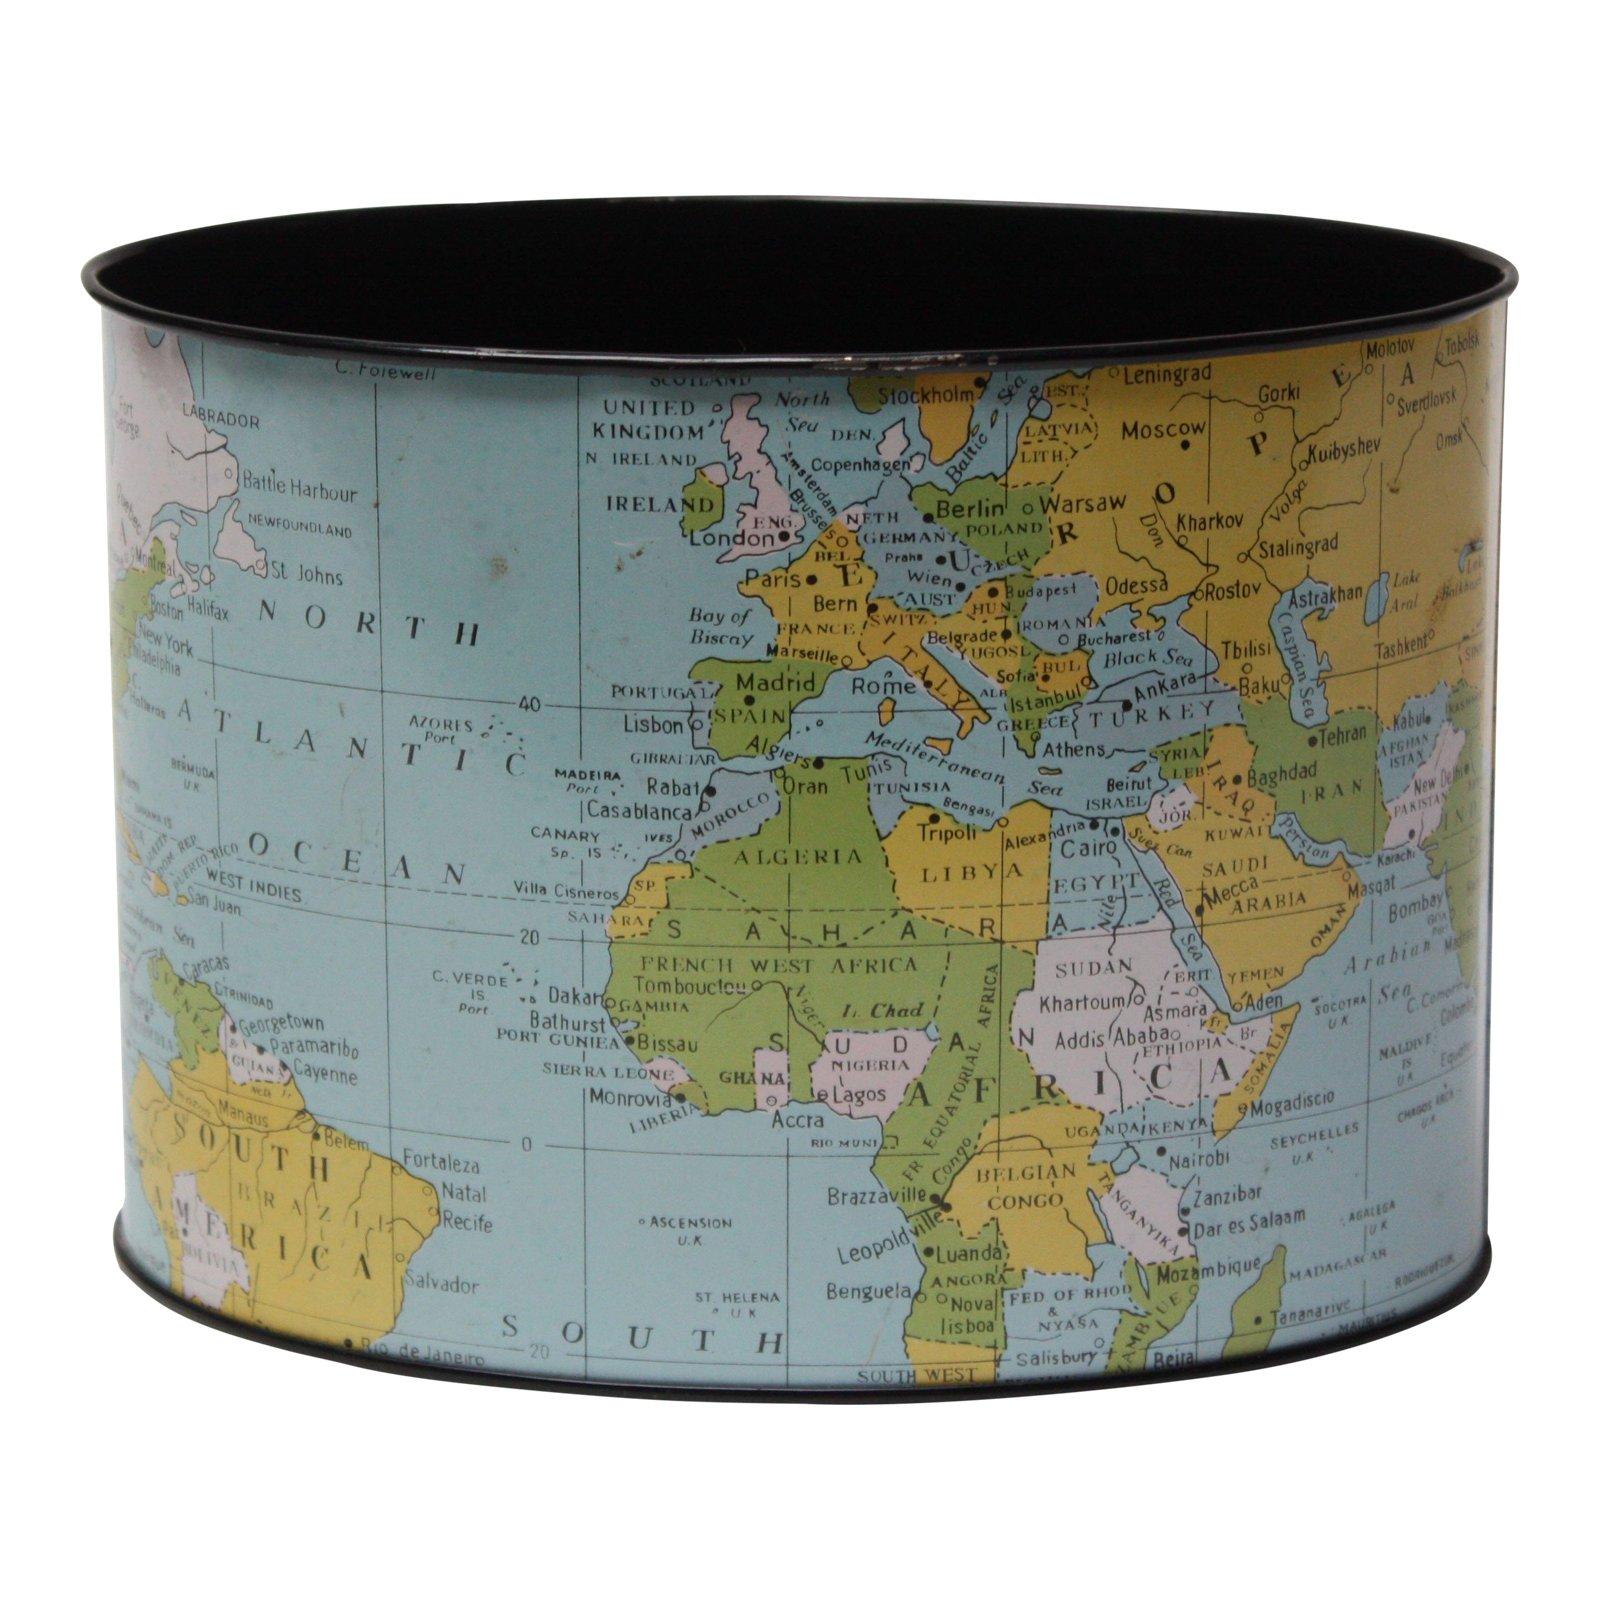 1958 Litho Tin World Map Desk Organizer on